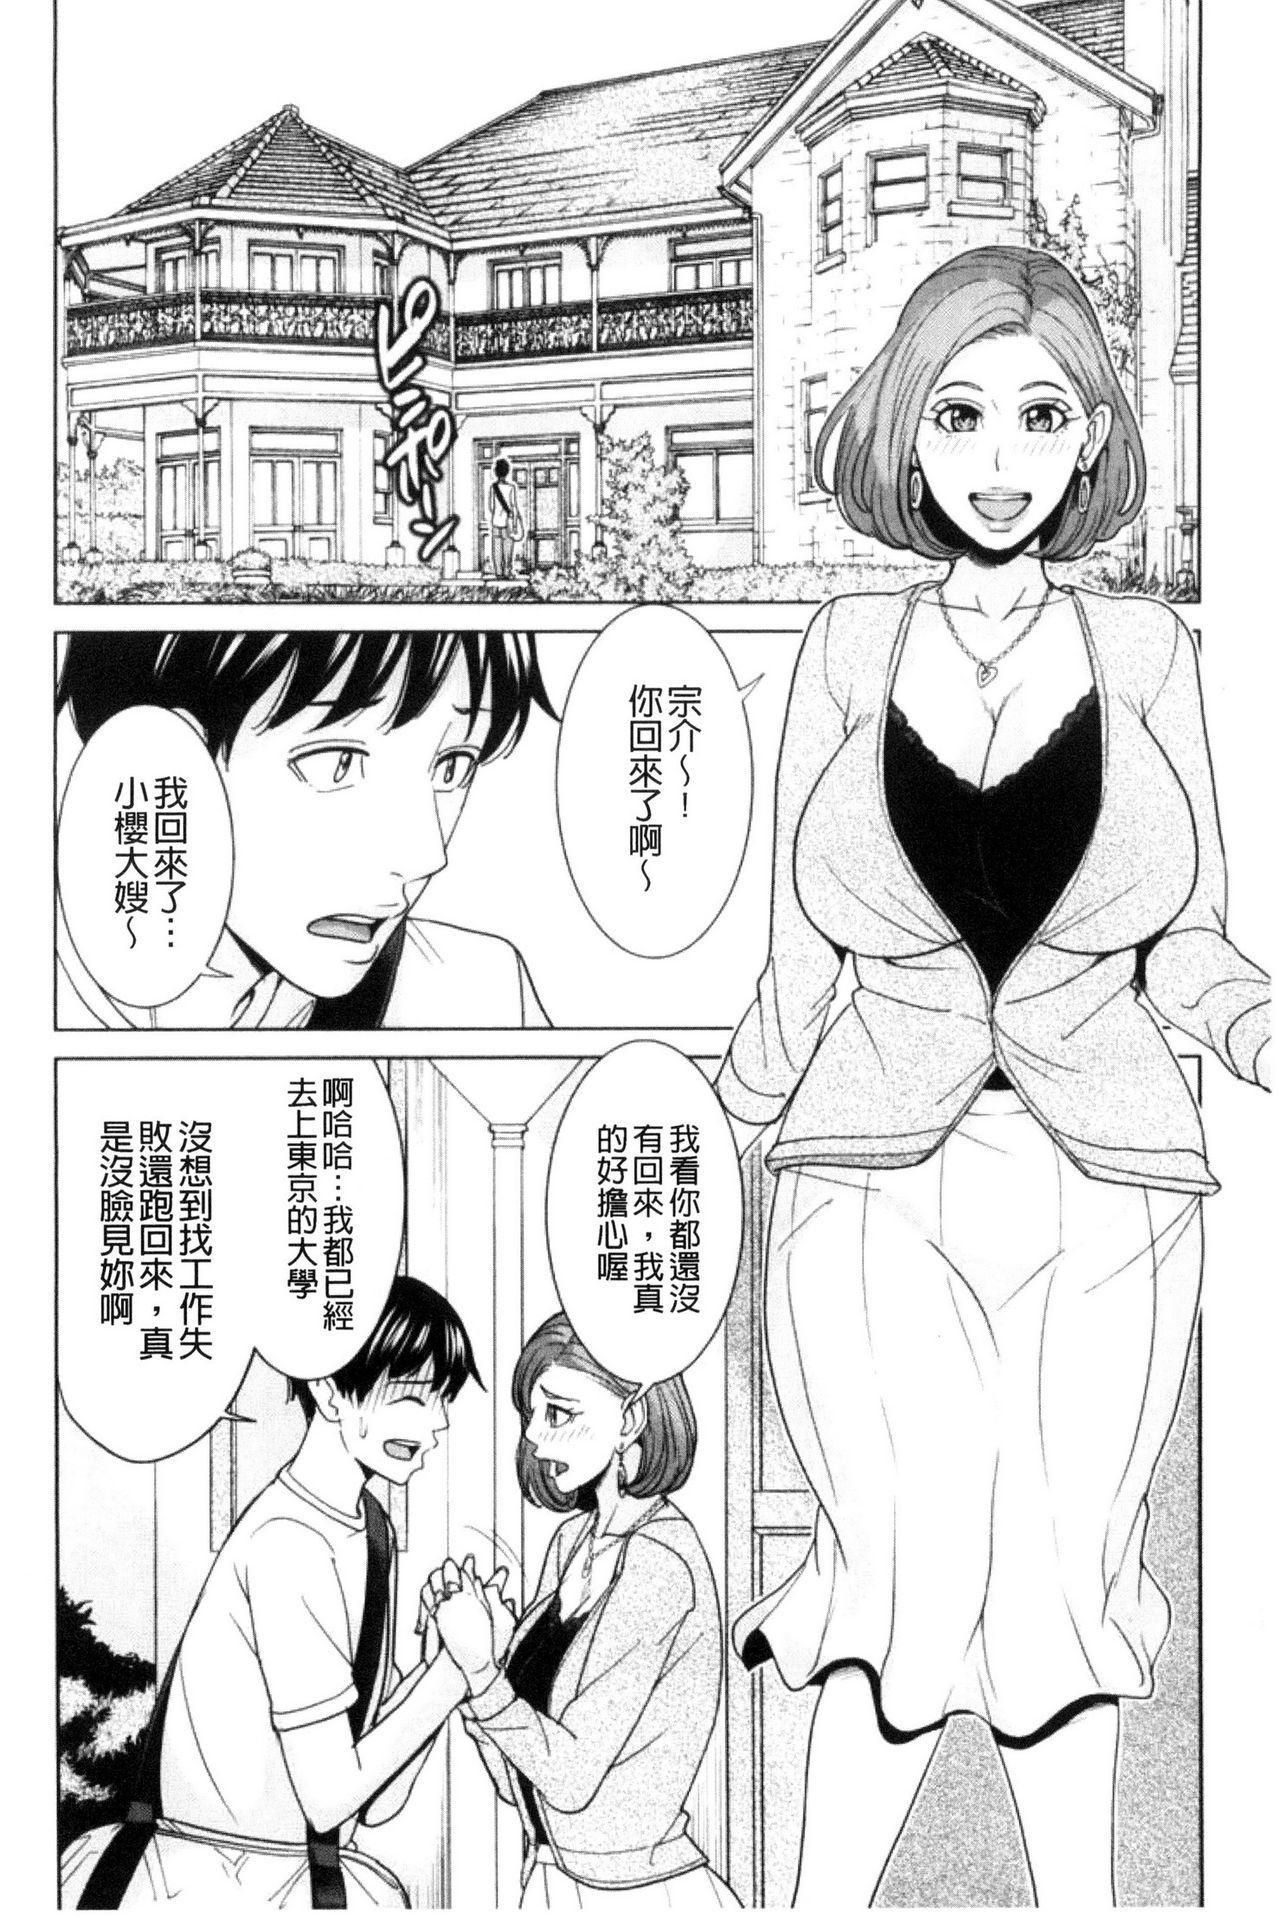 Aniyome Bitch Life   兄嫂淫蕩女性生活 6